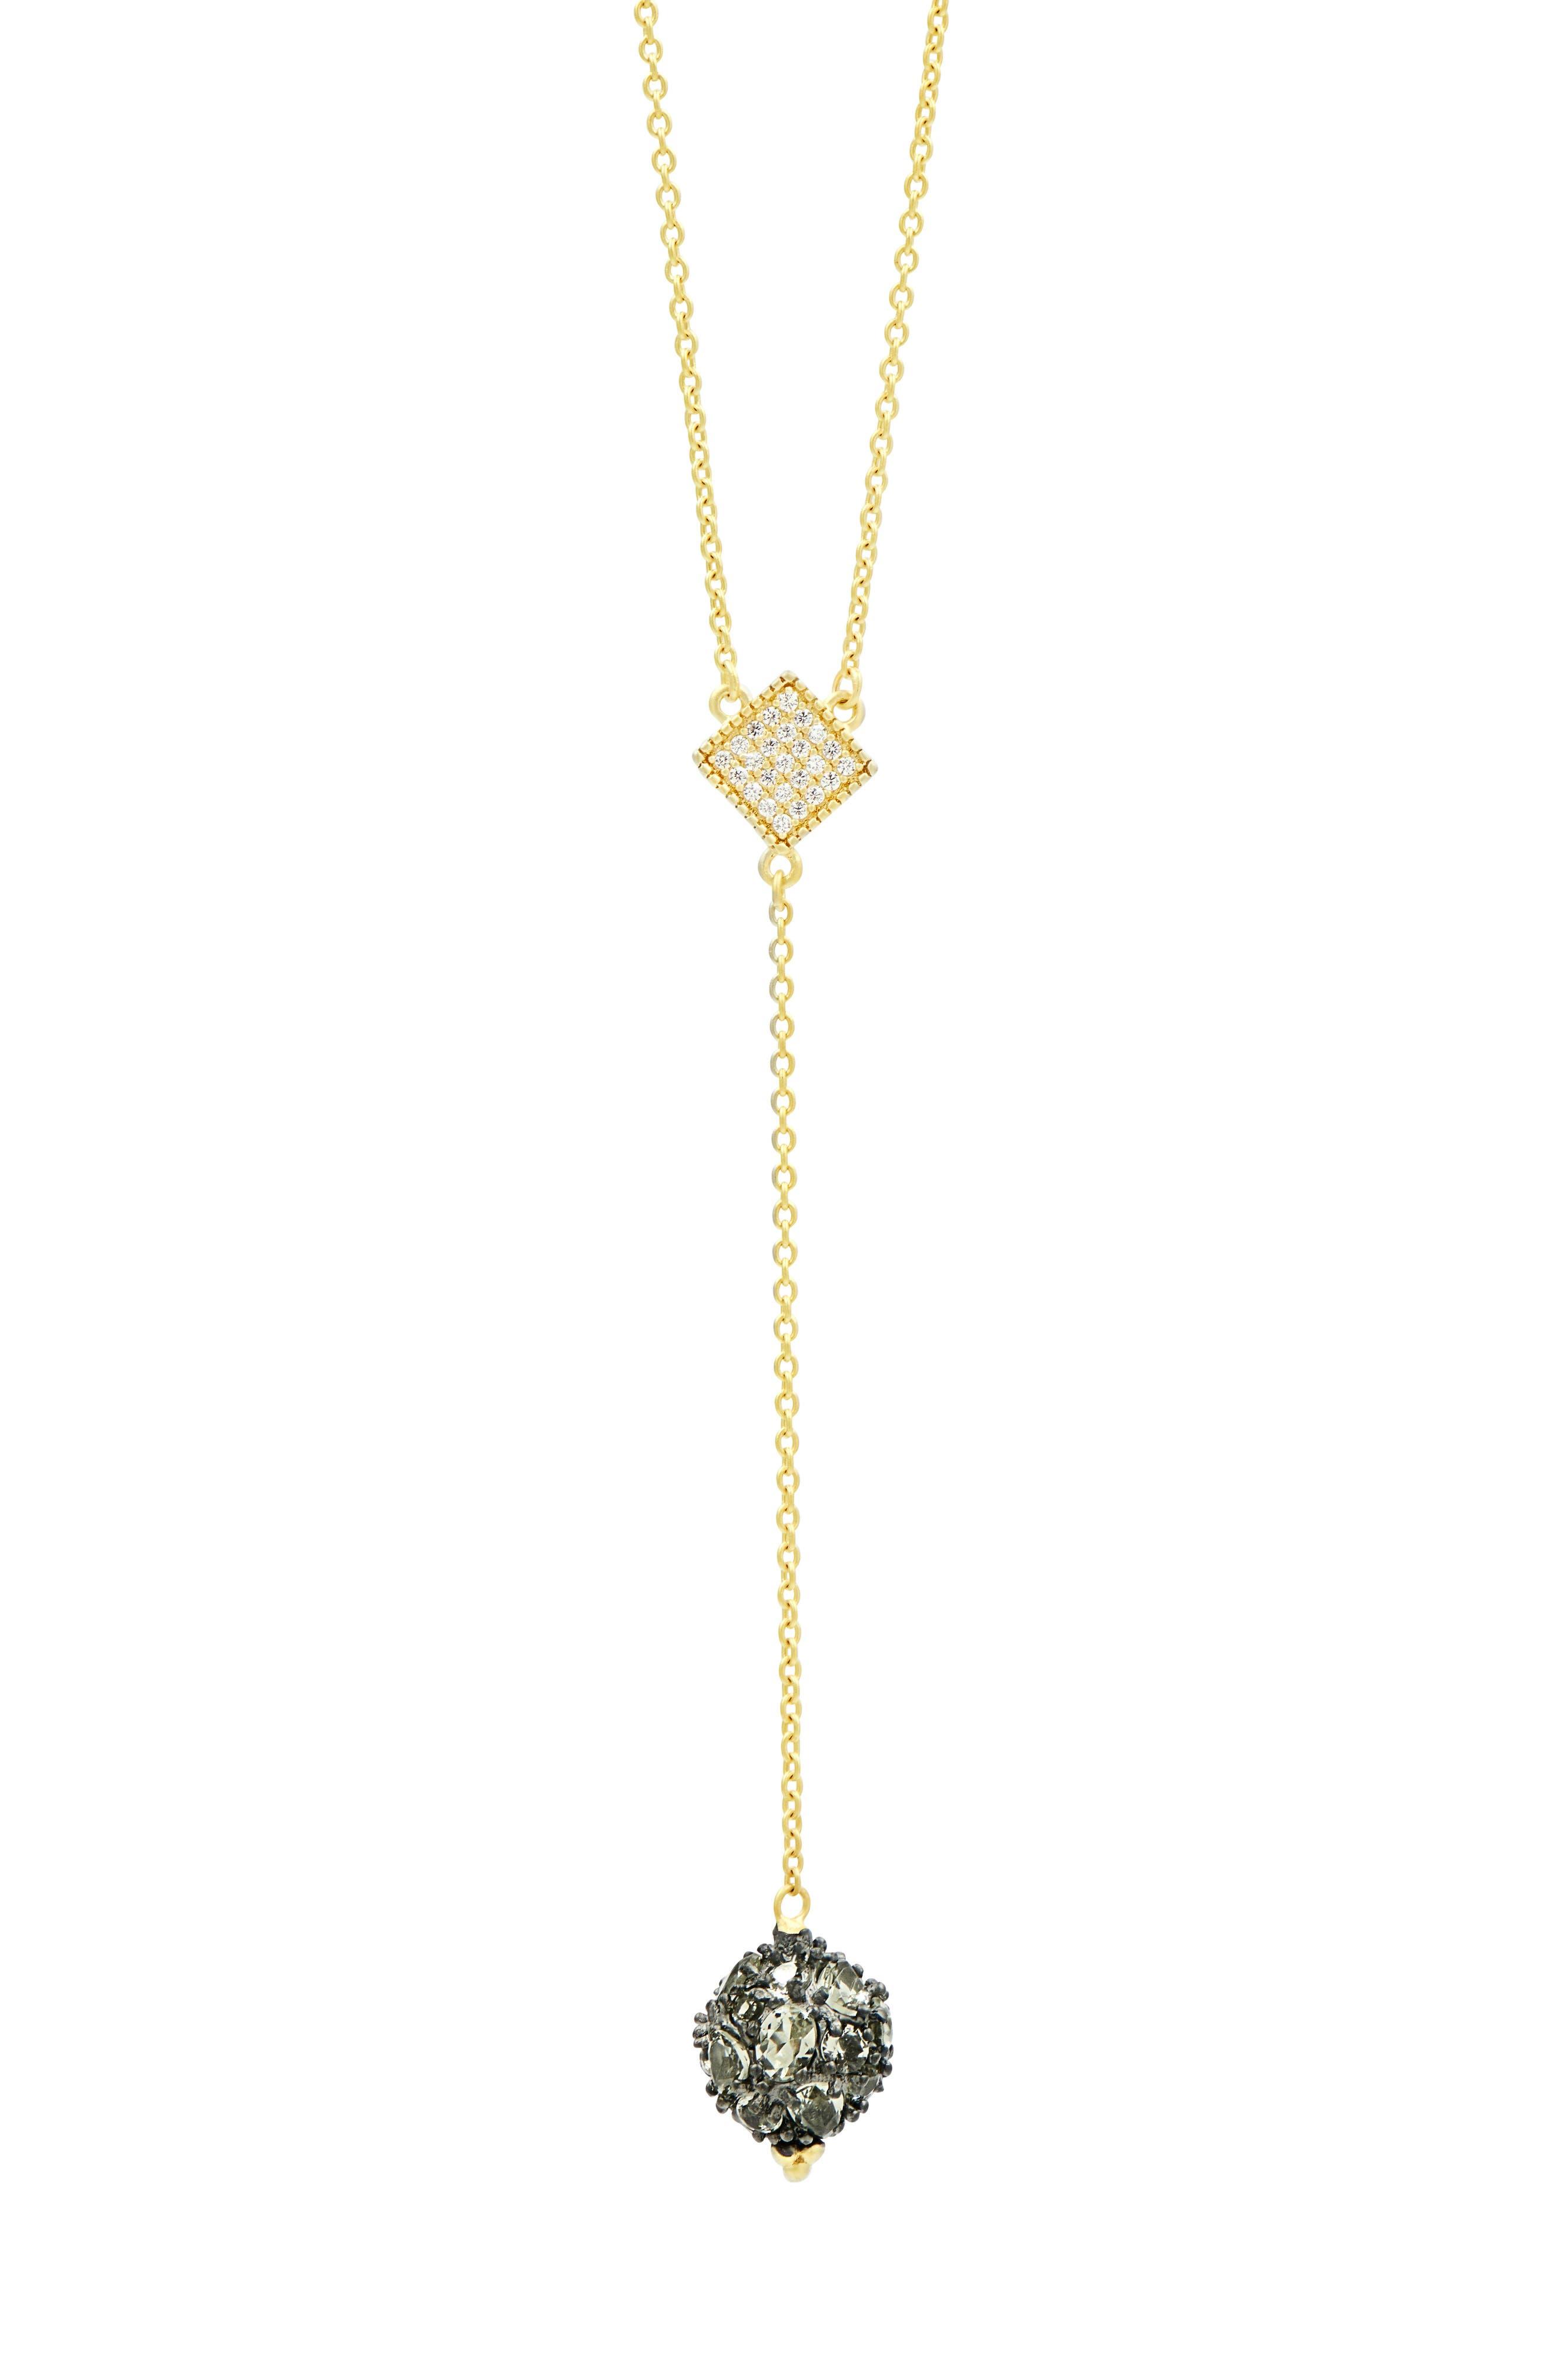 Main Image - FREIDA ROTHMAN Rose Dor Y-Shape Necklace